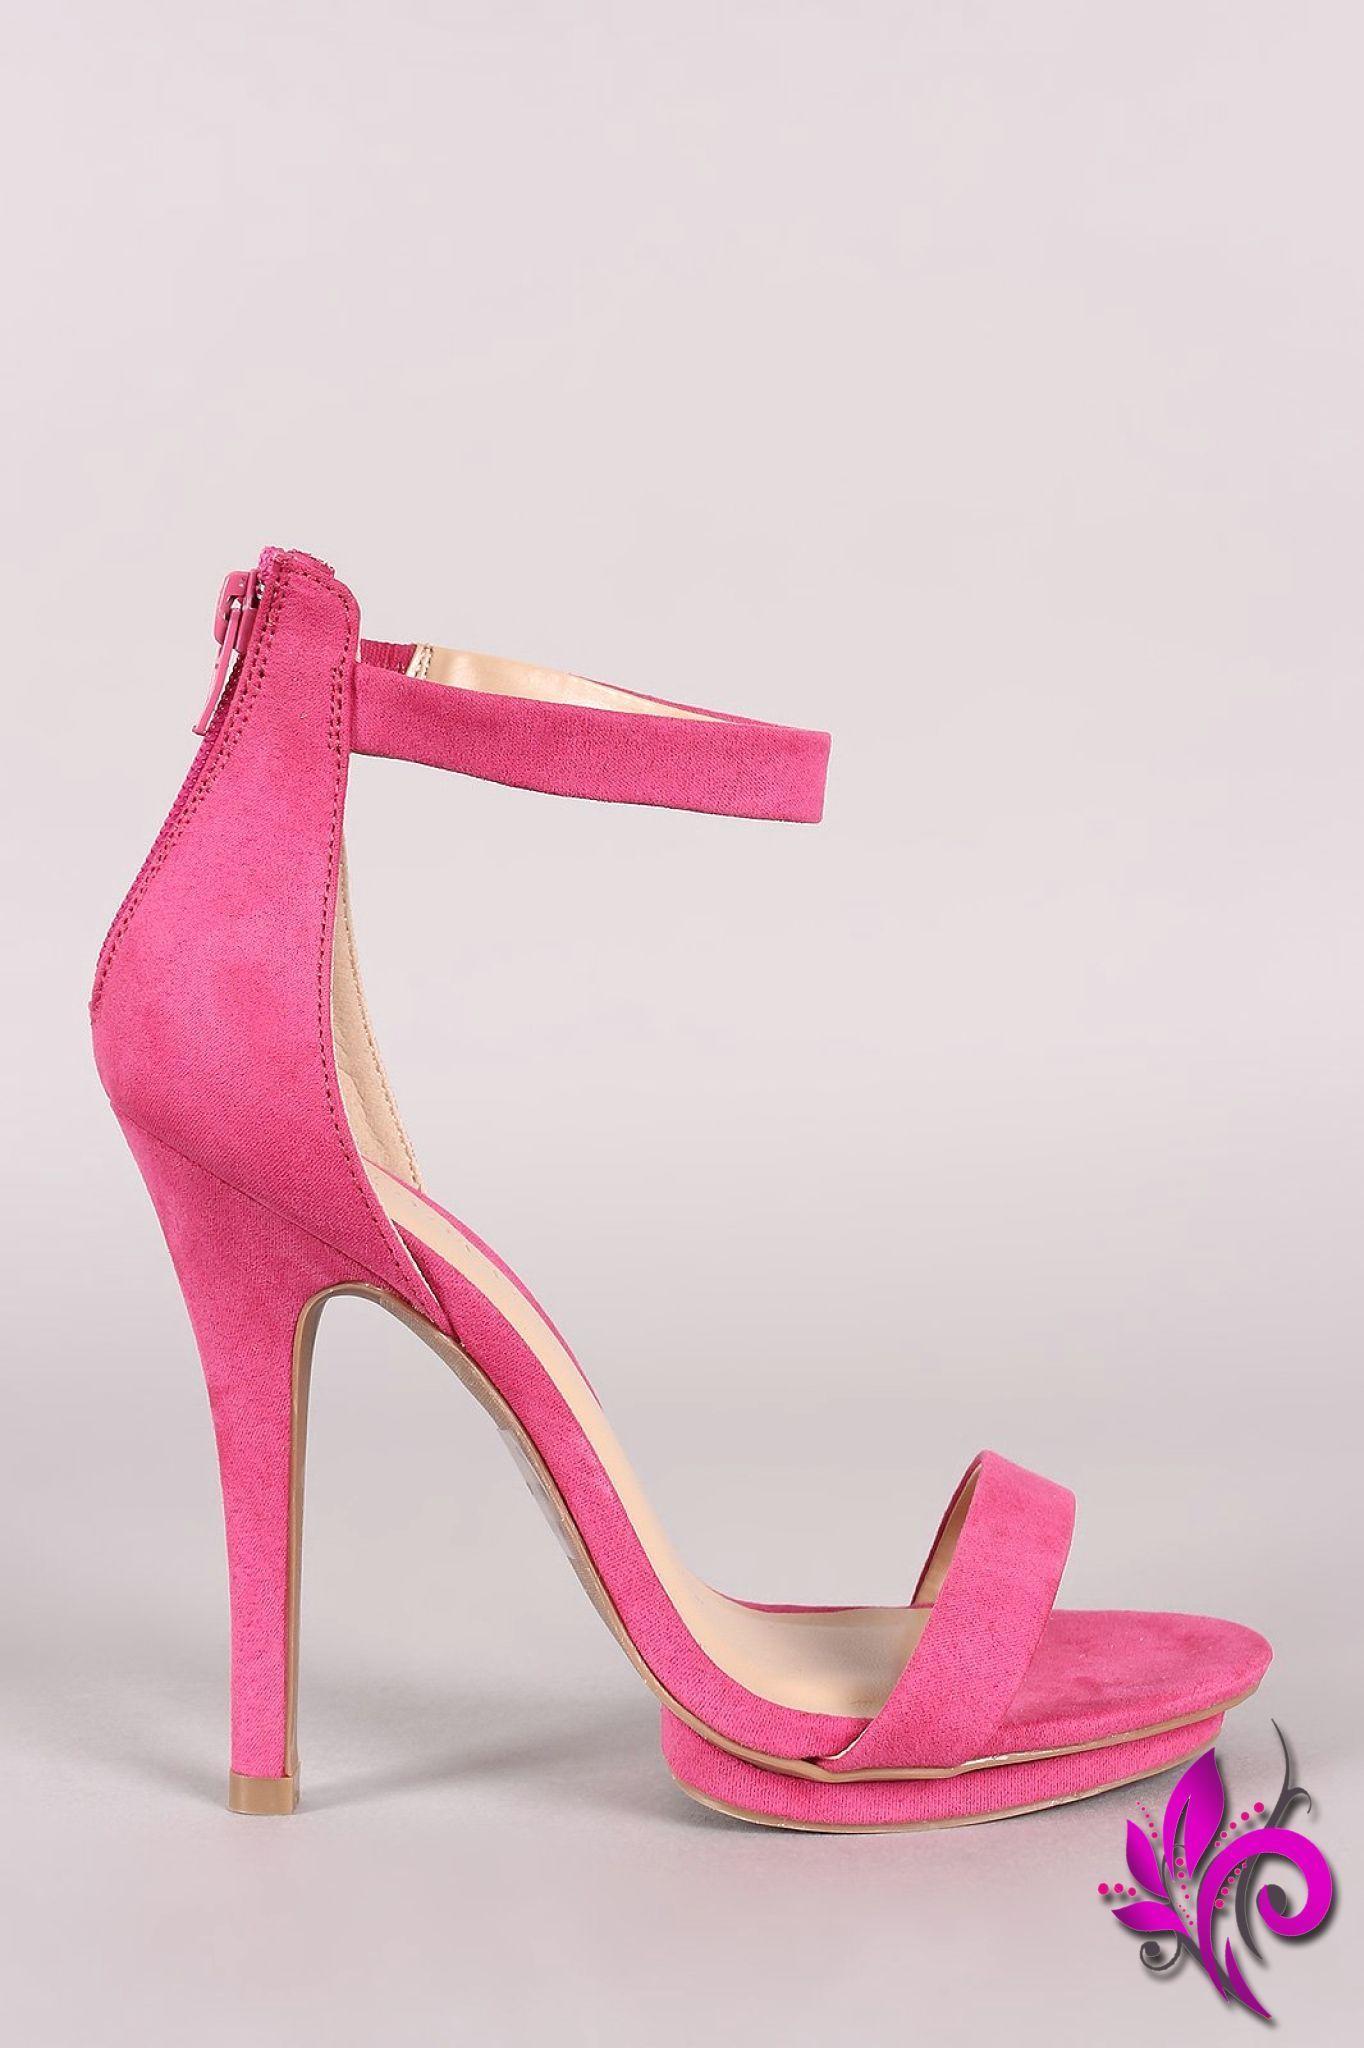 4a46d9b795d Wild Diva Lounge Suede Ankle Strap Stiletto Heel